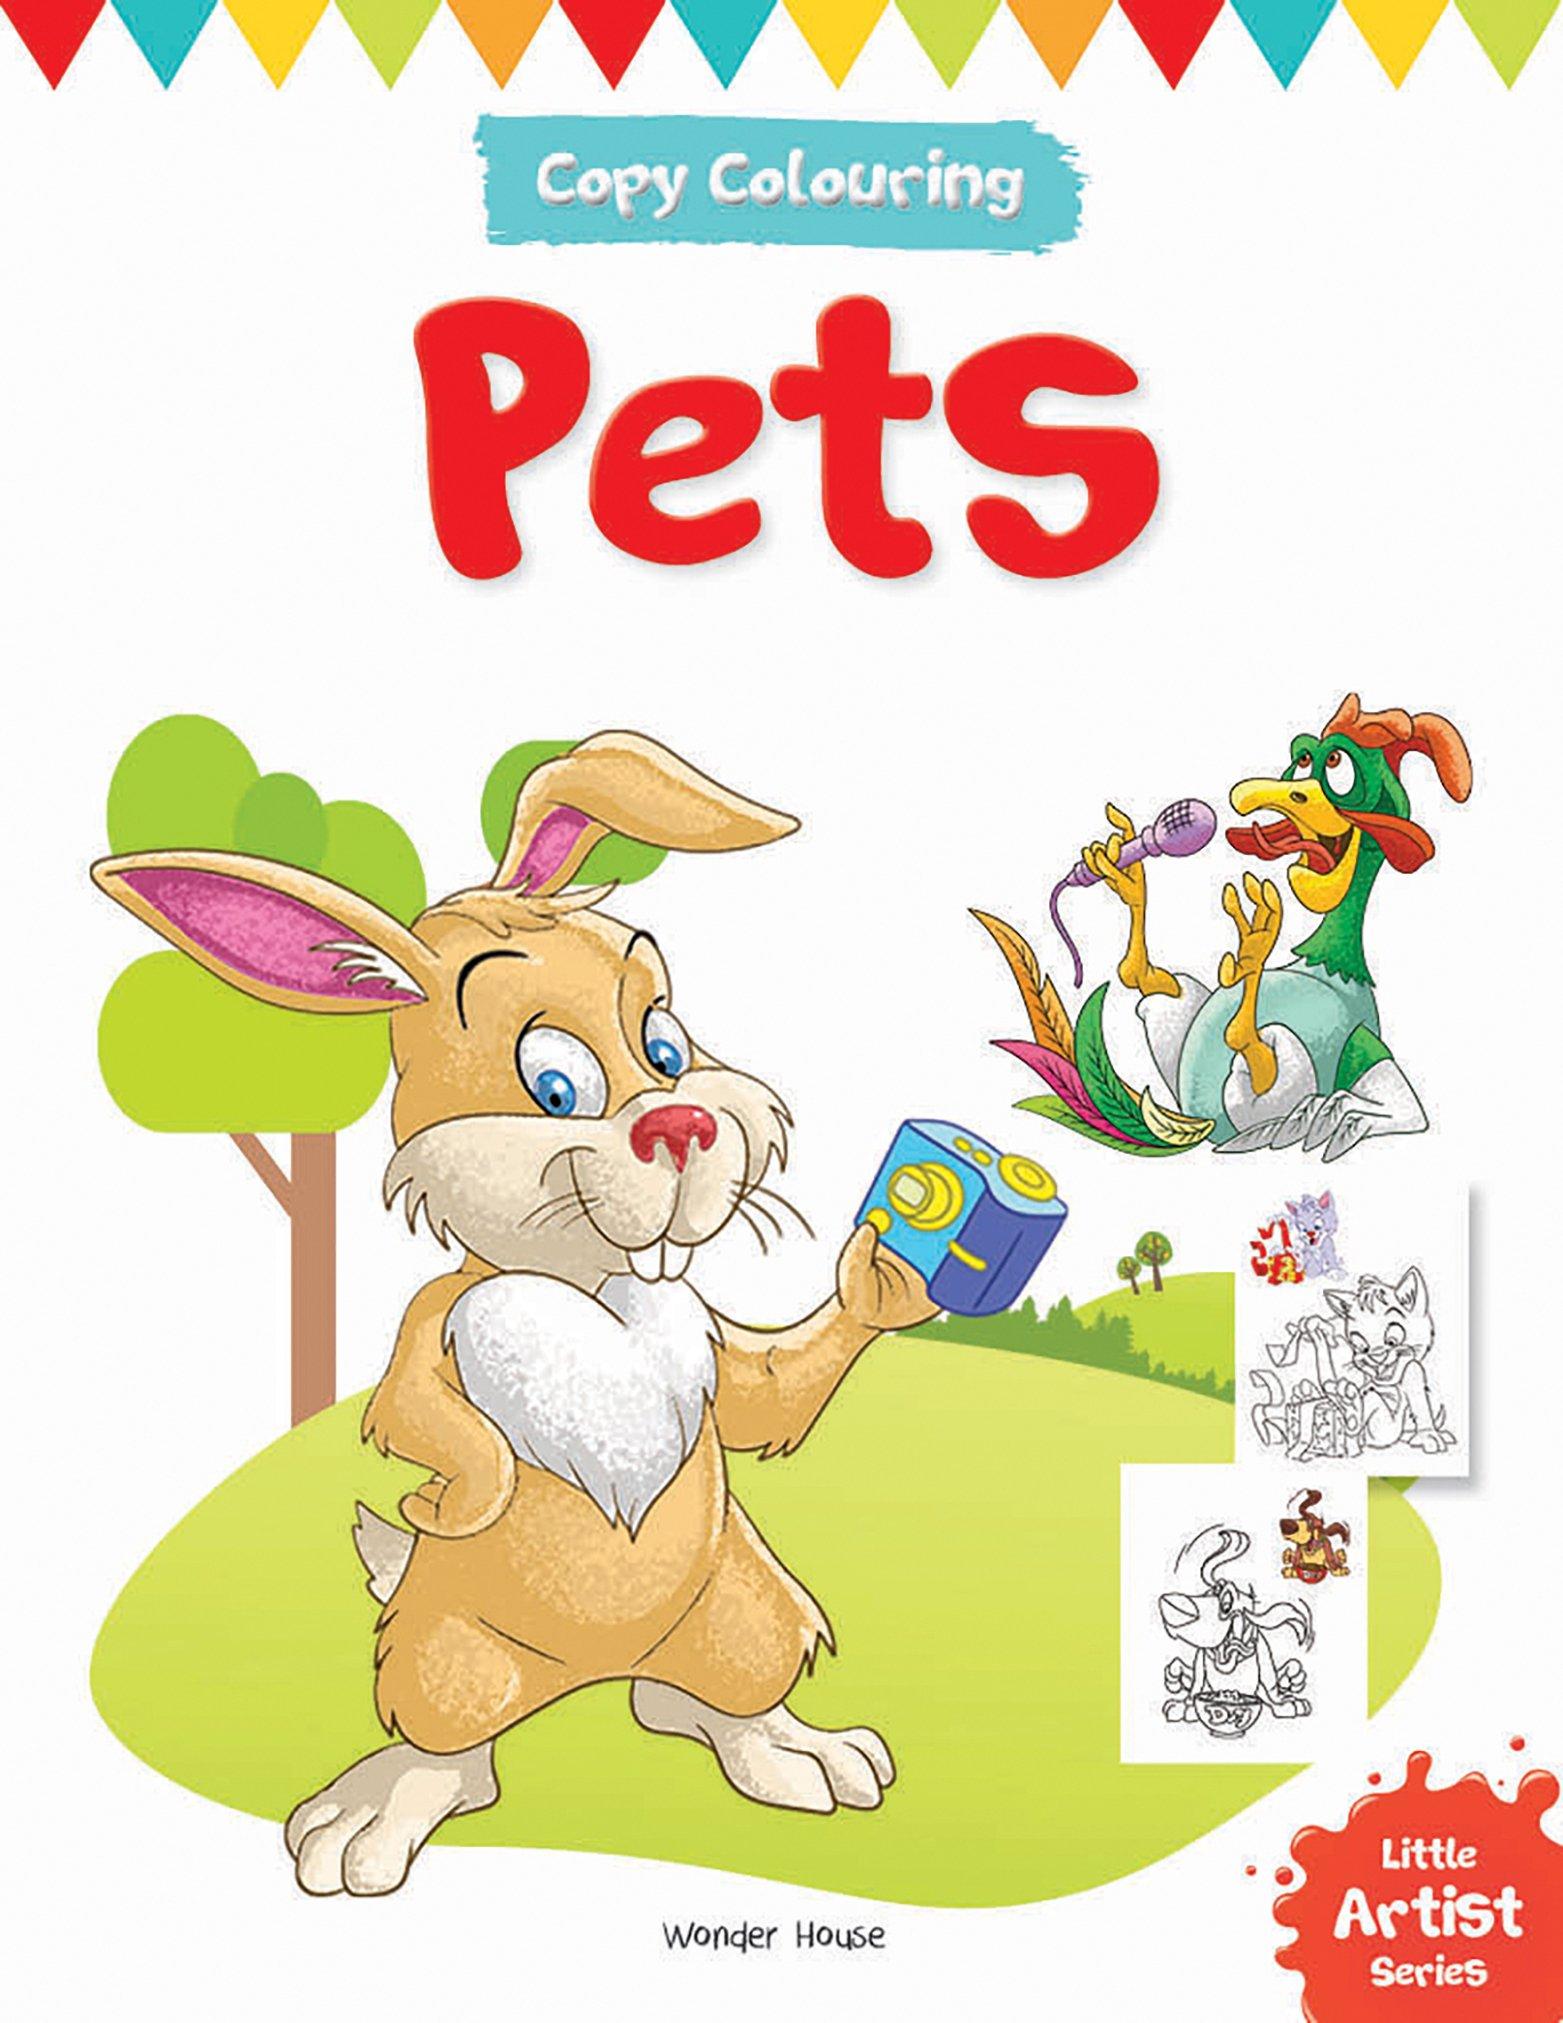 Little Artist Series - Pets : Copy Colouring Books